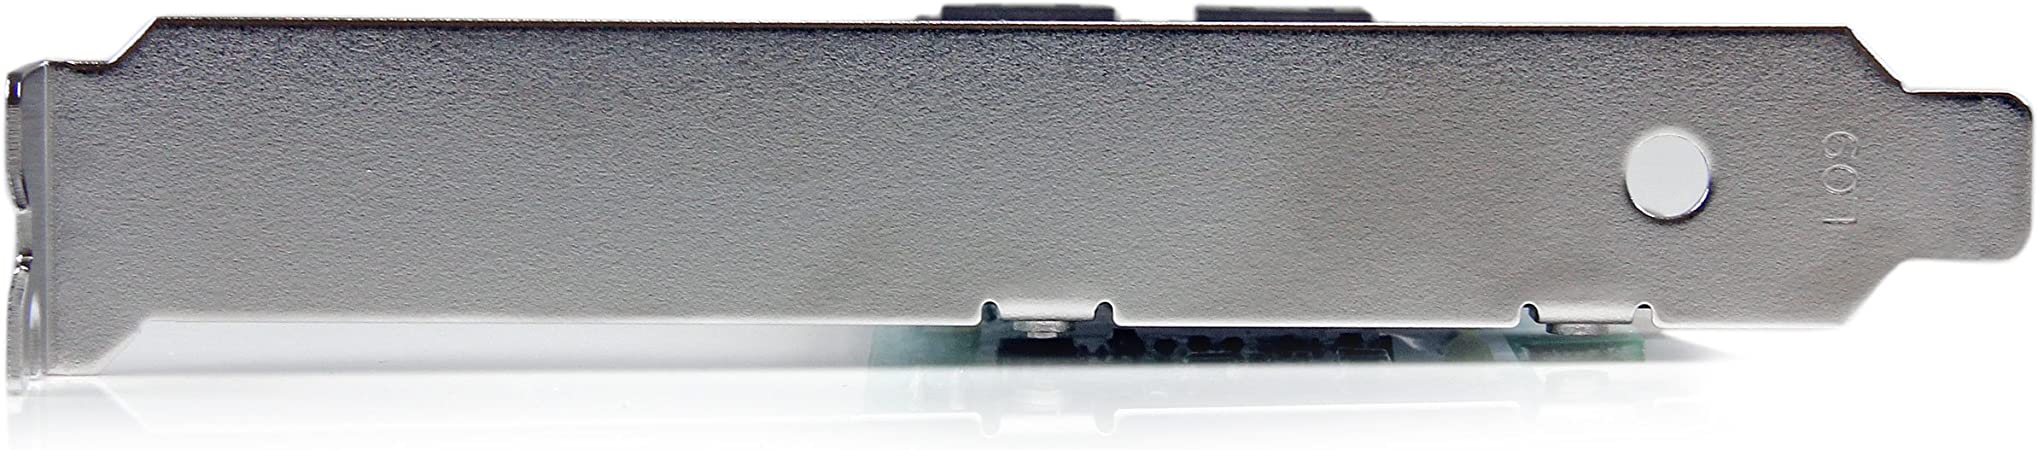 StarTech.com 4 Port PCI Express 2.0 SATA III 6Gbps RAID Controller Card with HyperDuo SSD Tiering - PCIe SATA 3 Controller Adapter (PEXSAT34RH)